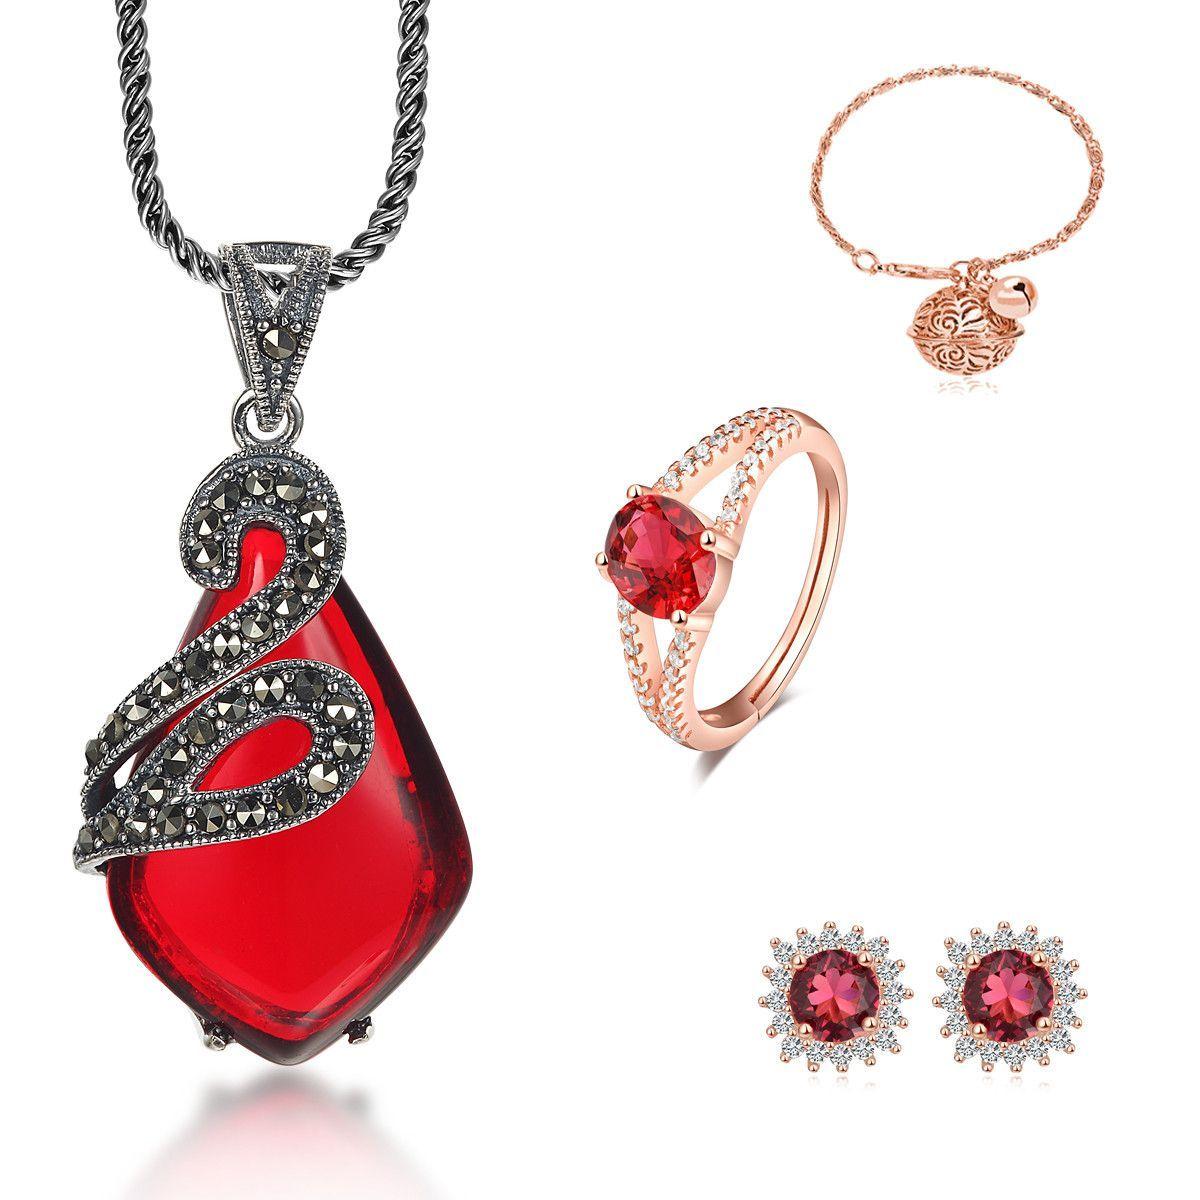 Ruby red gemstone u gold jewelry set pendant ring bracelet and